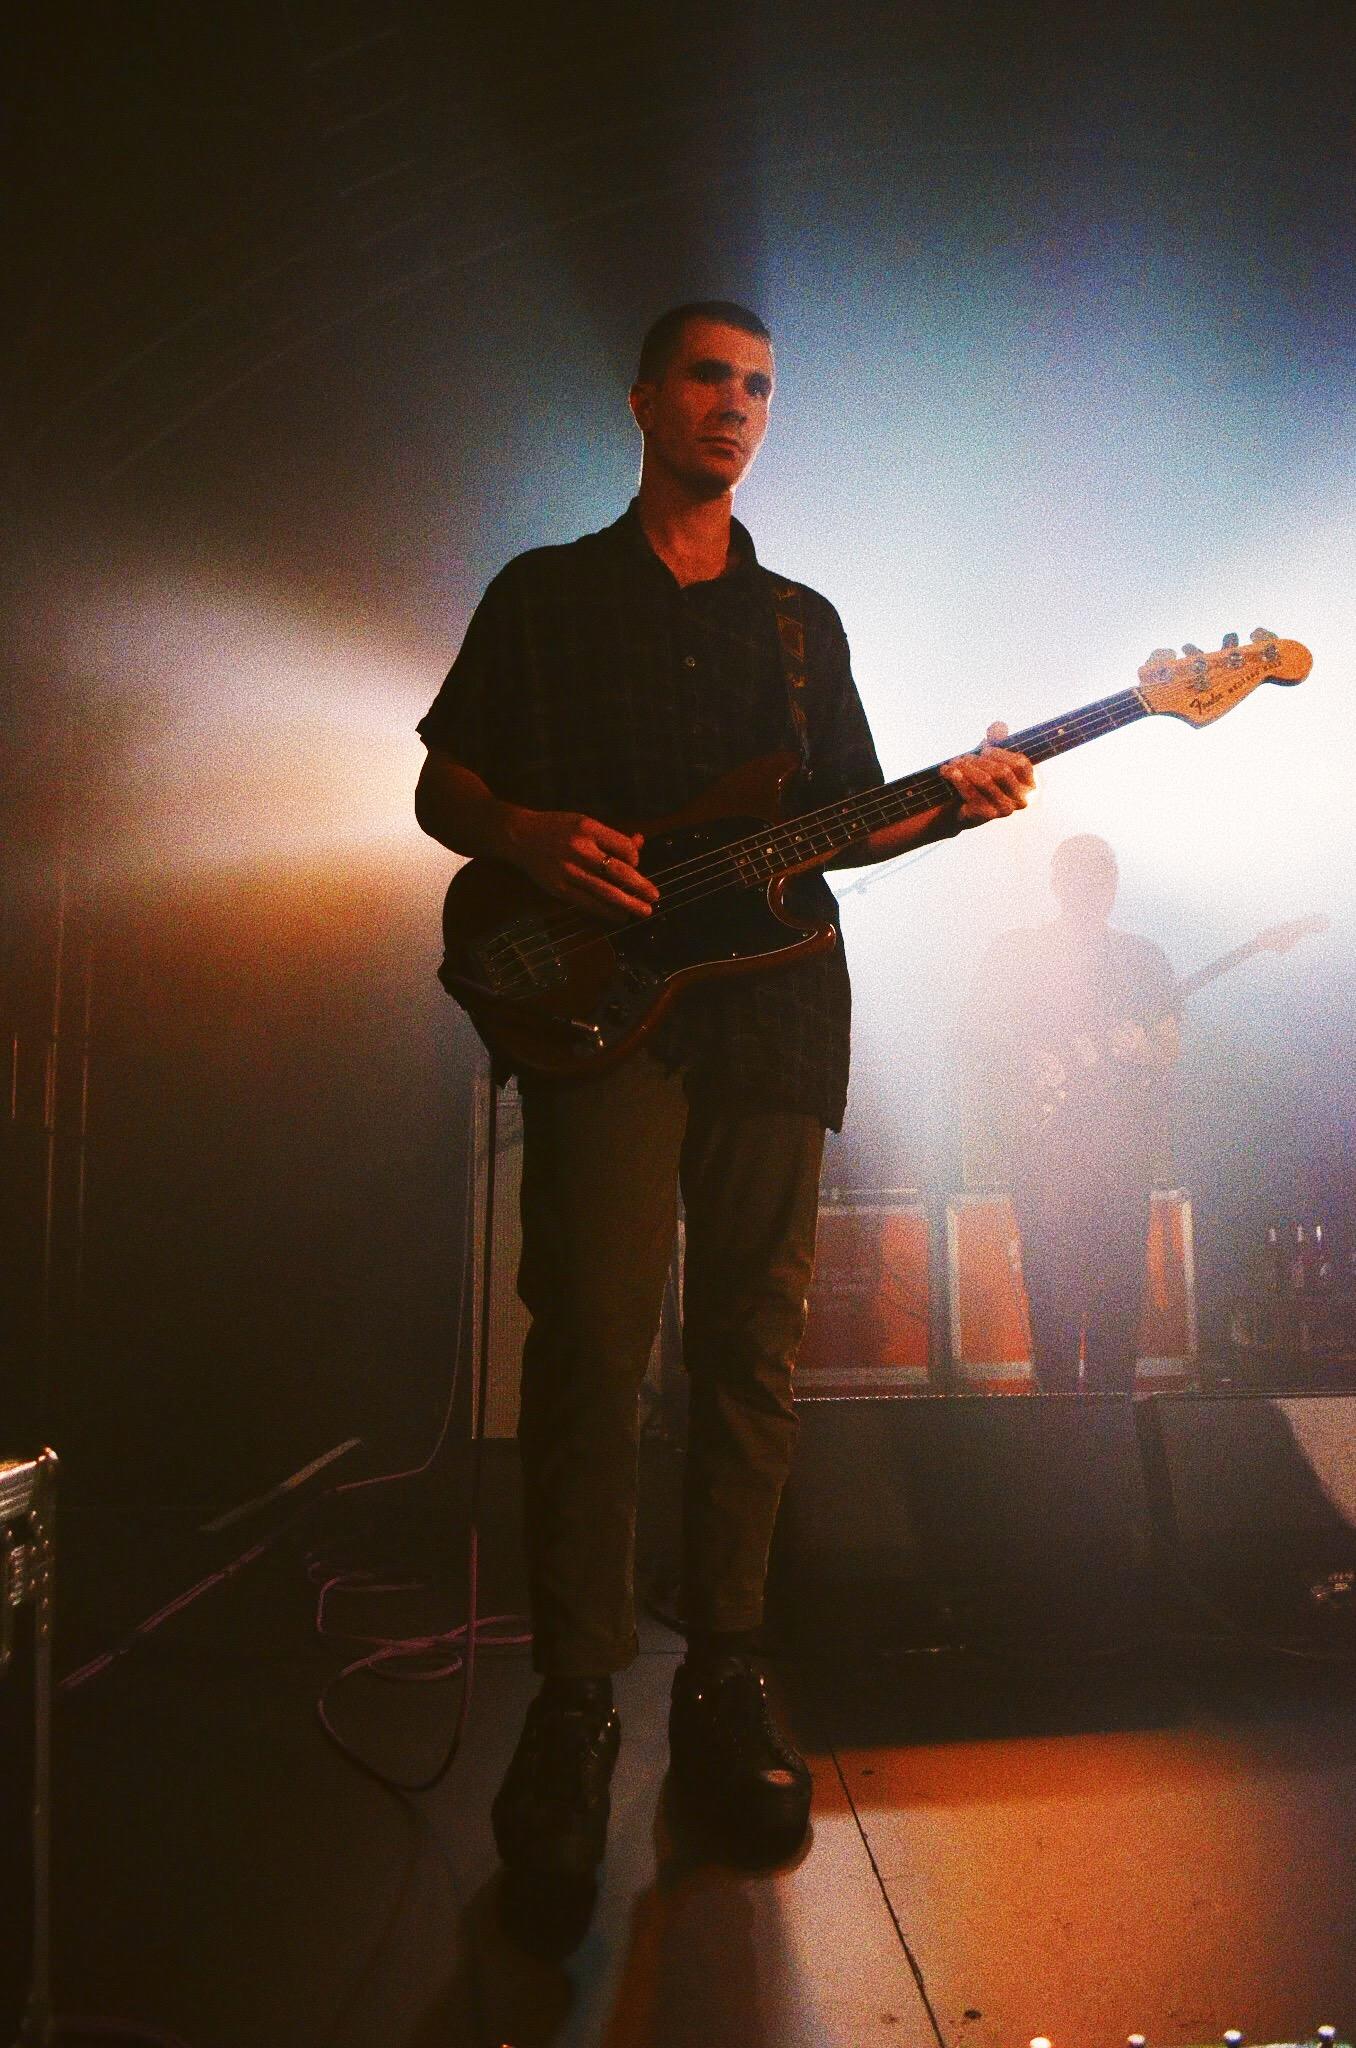 dmas music live review melbourne photo credit ryley clarke savage thrills savagethrills 7